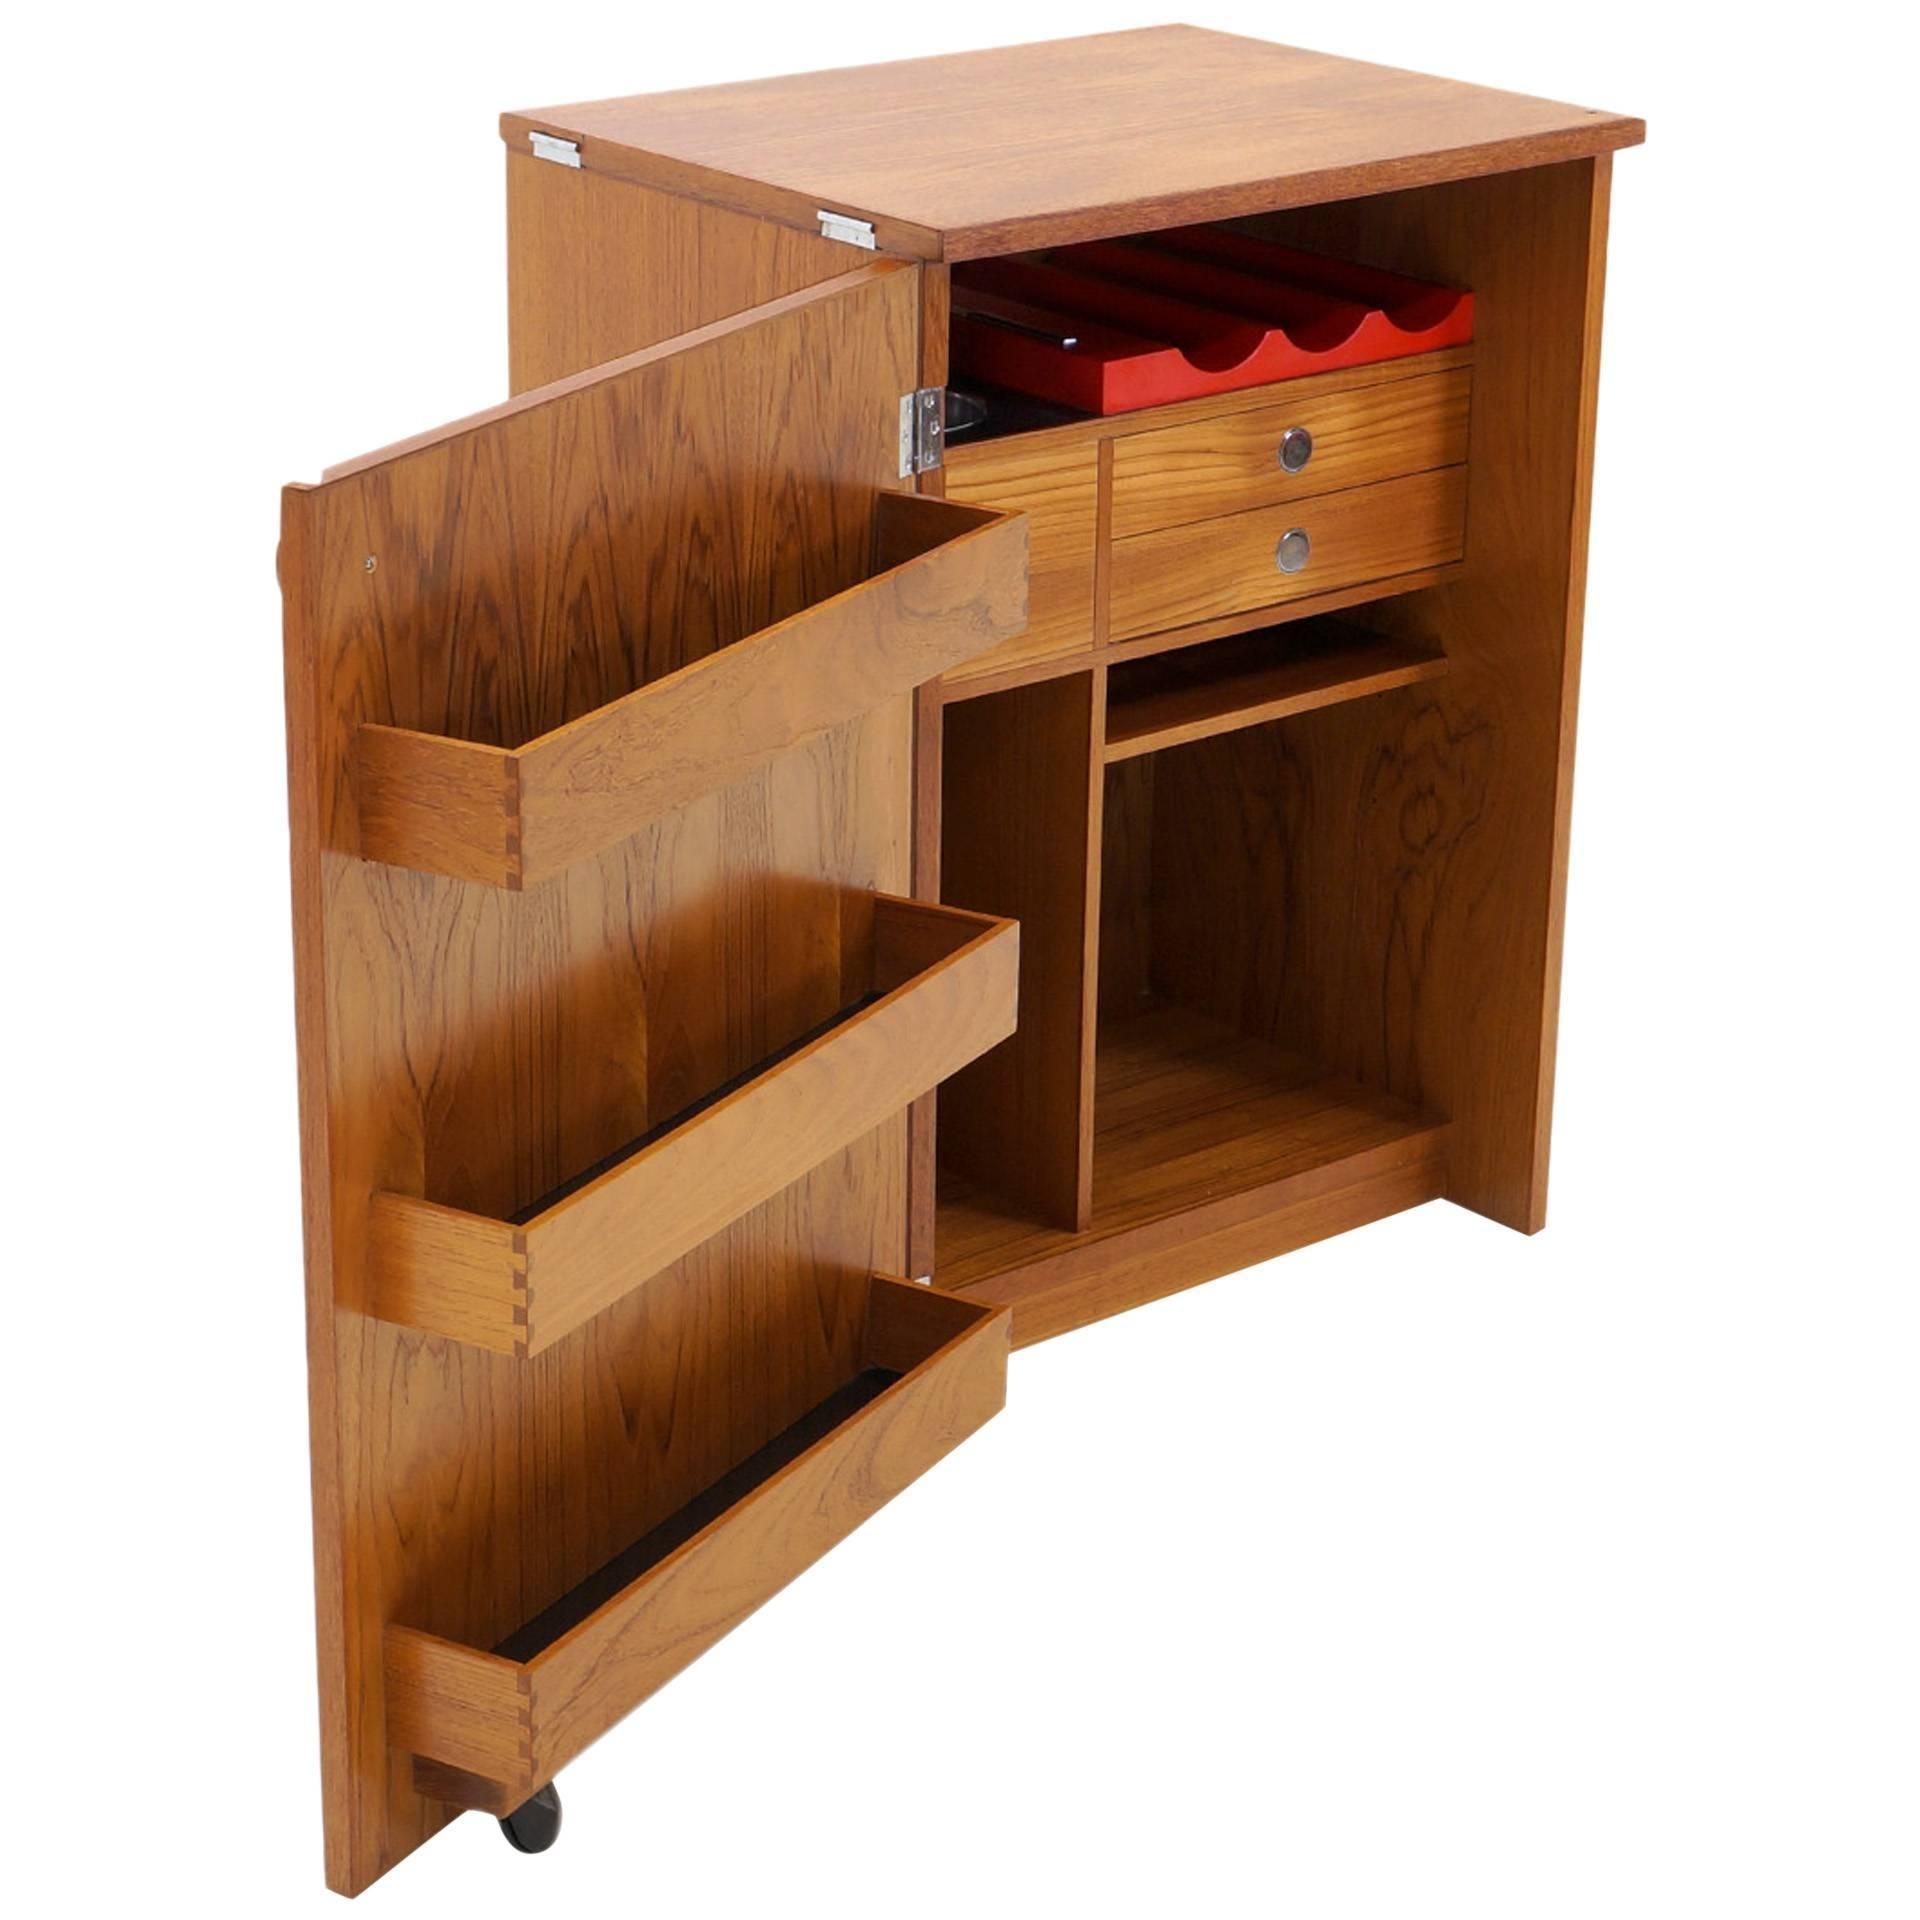 Erik buch portable bar cabinet or bar cart on casters teak all original for sale at 1stdibs